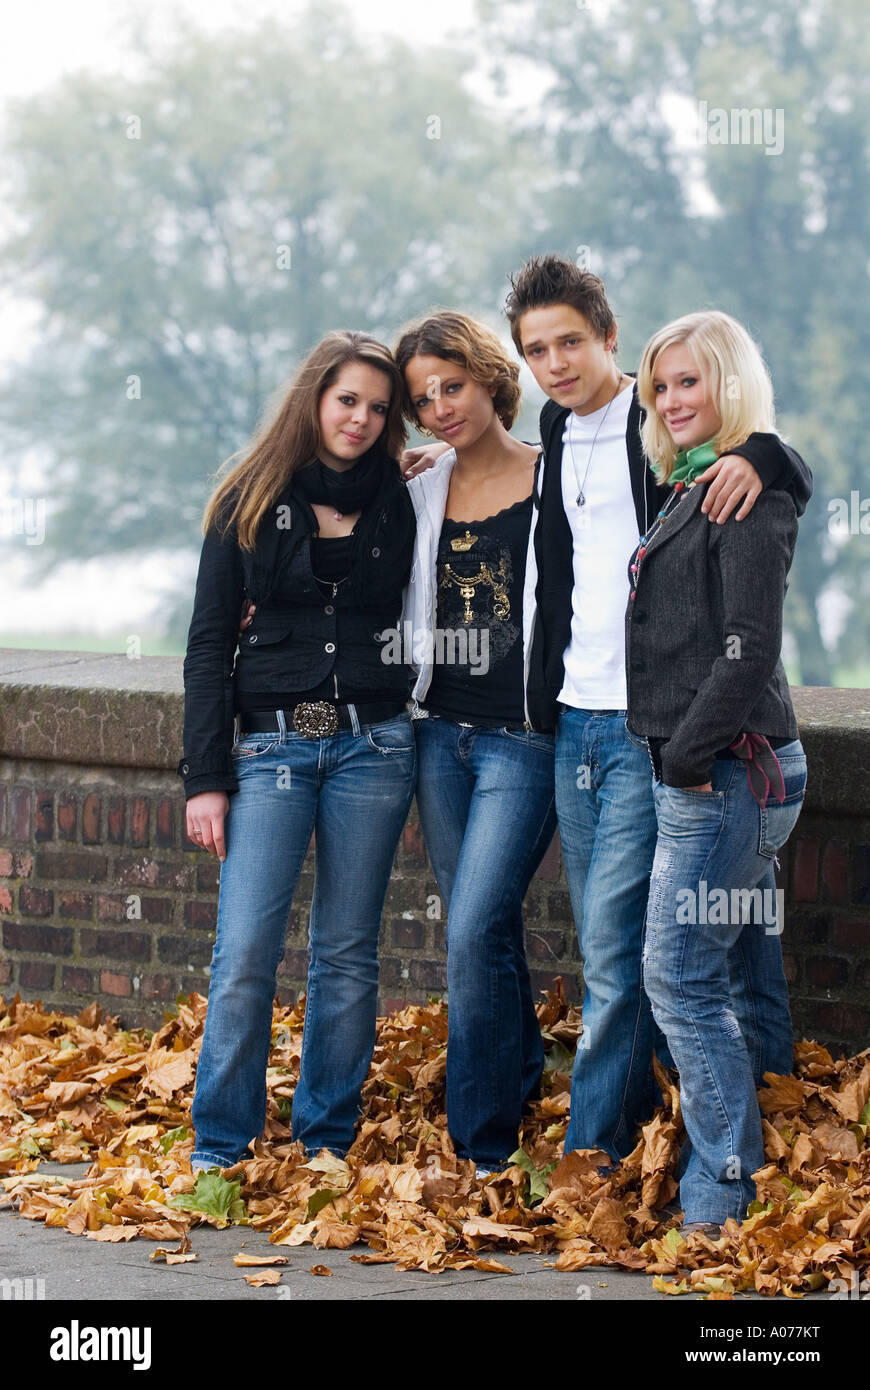 three girls and one boy